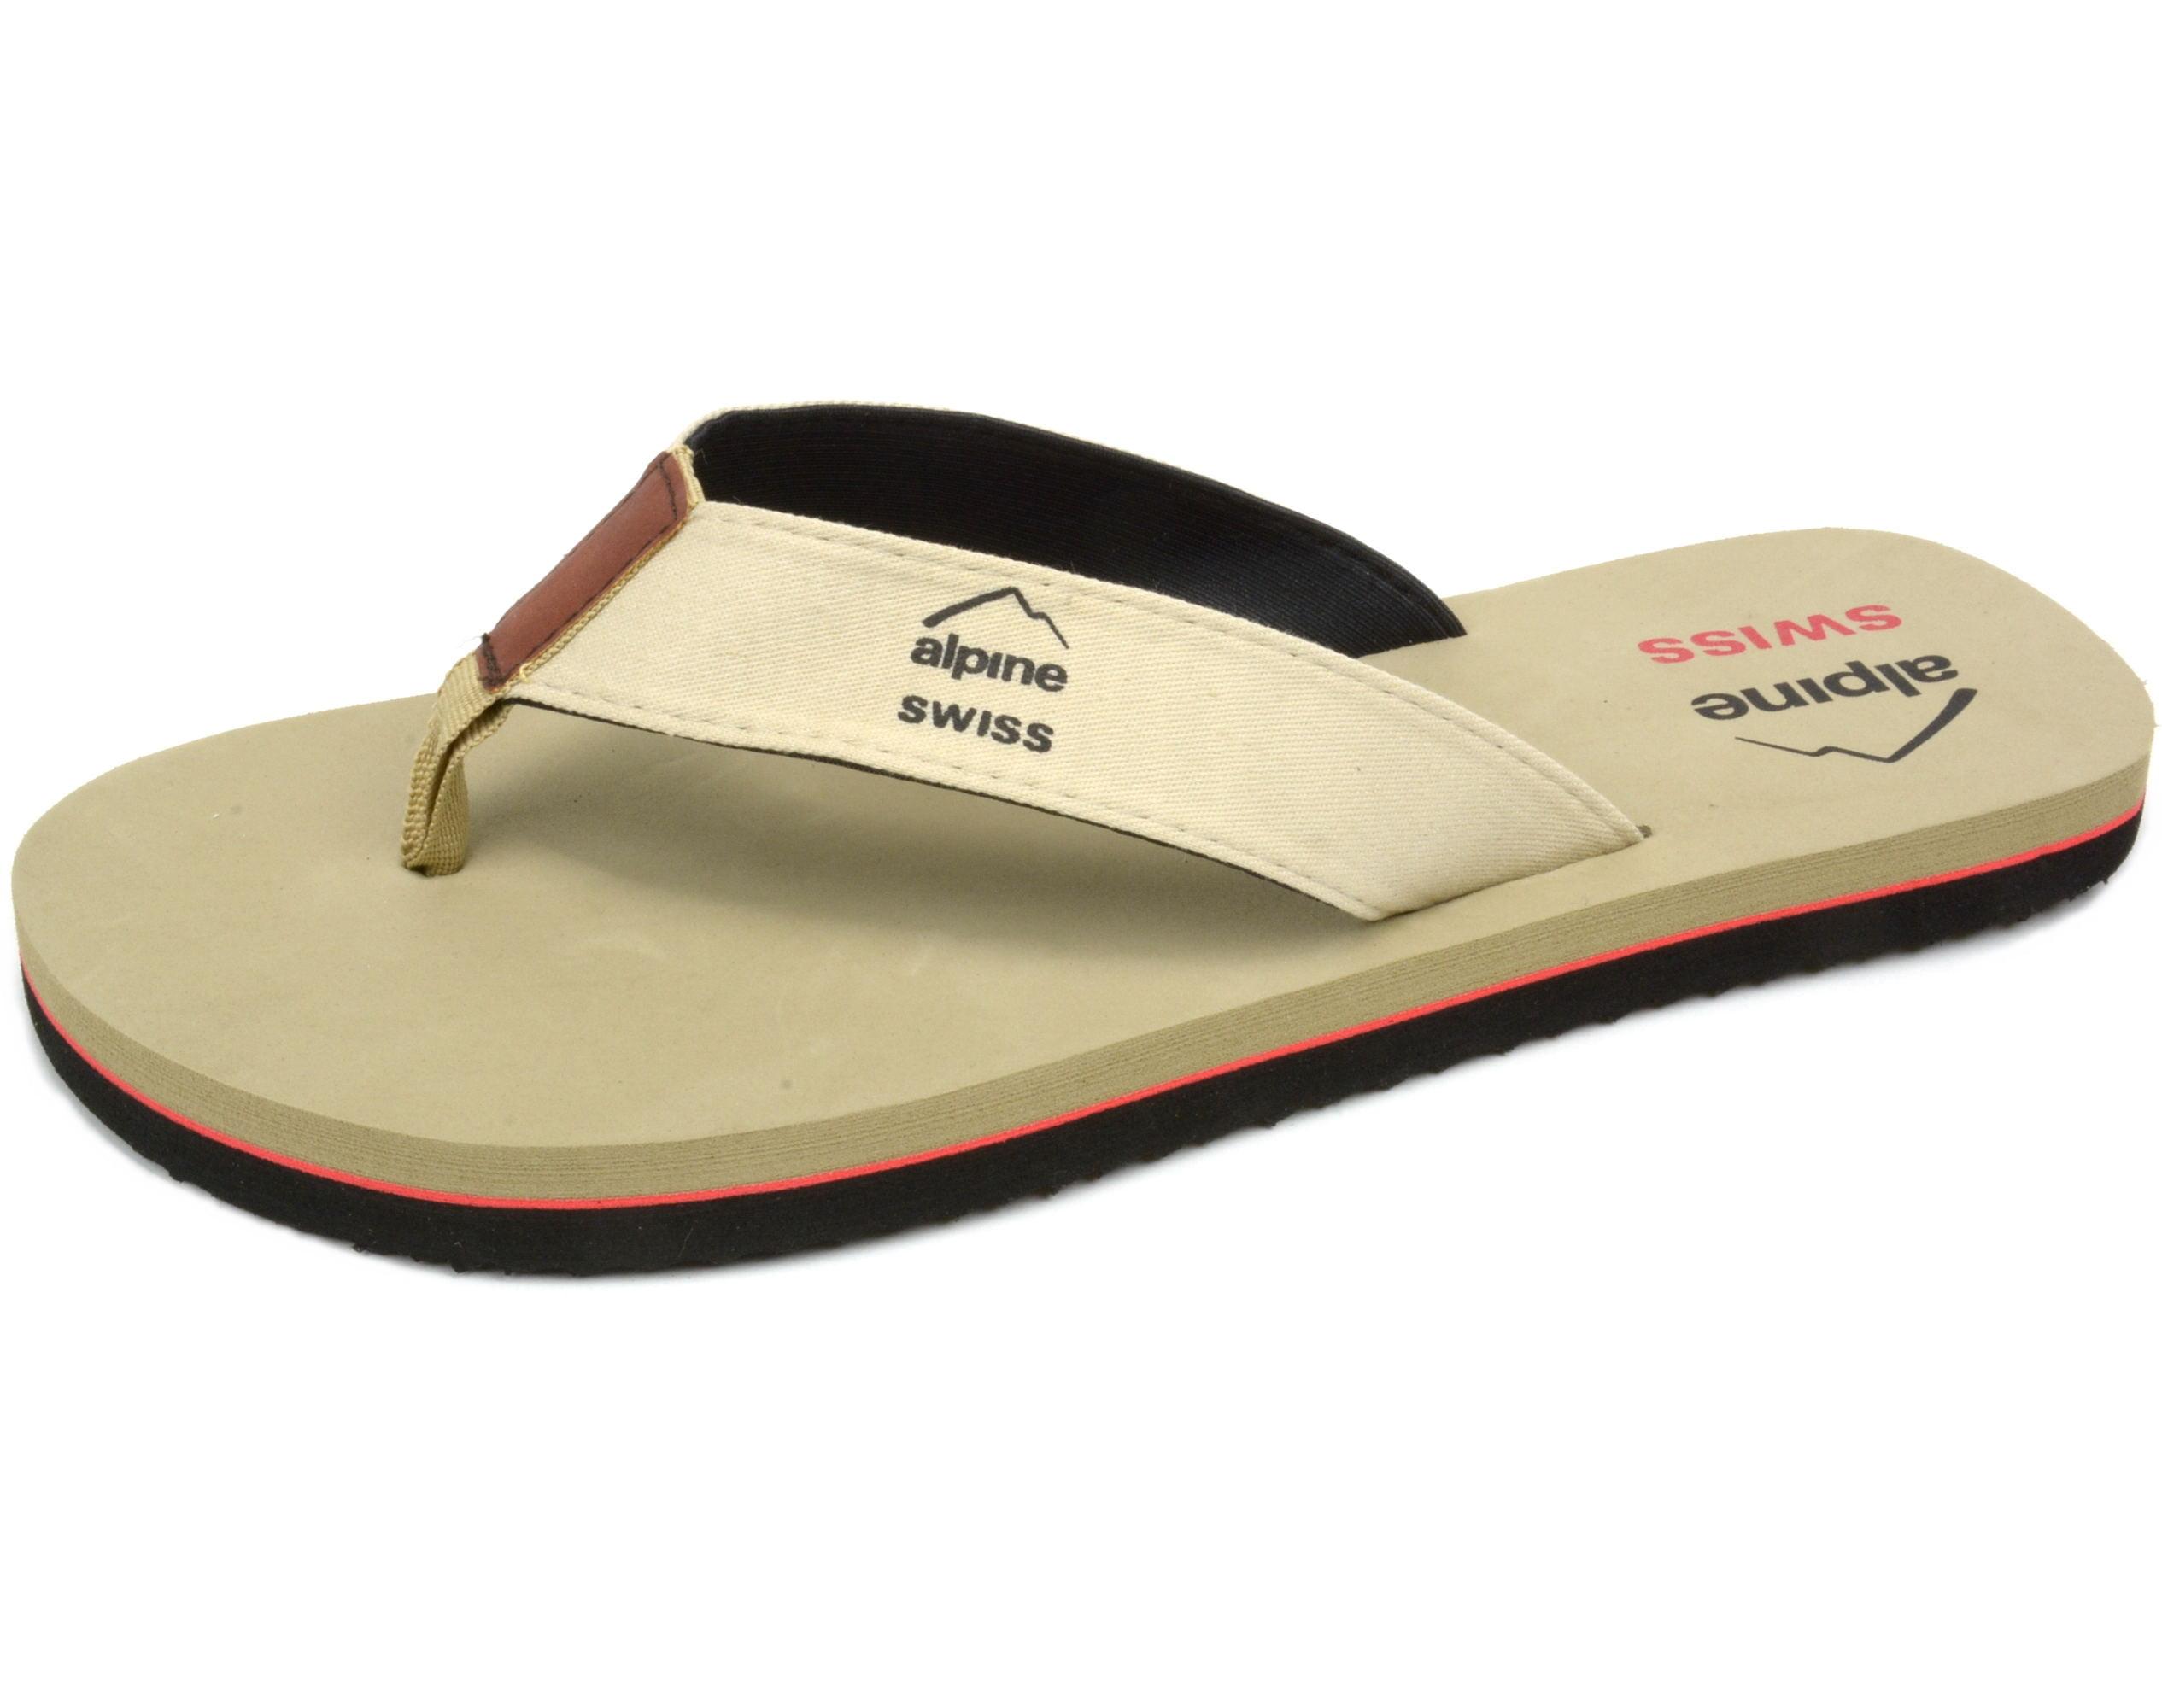 add0aa3c1 alpine-swiss - alpine swiss men s flip flops beach sandals lightweight eva sole  comfort thongs - Walmart.com